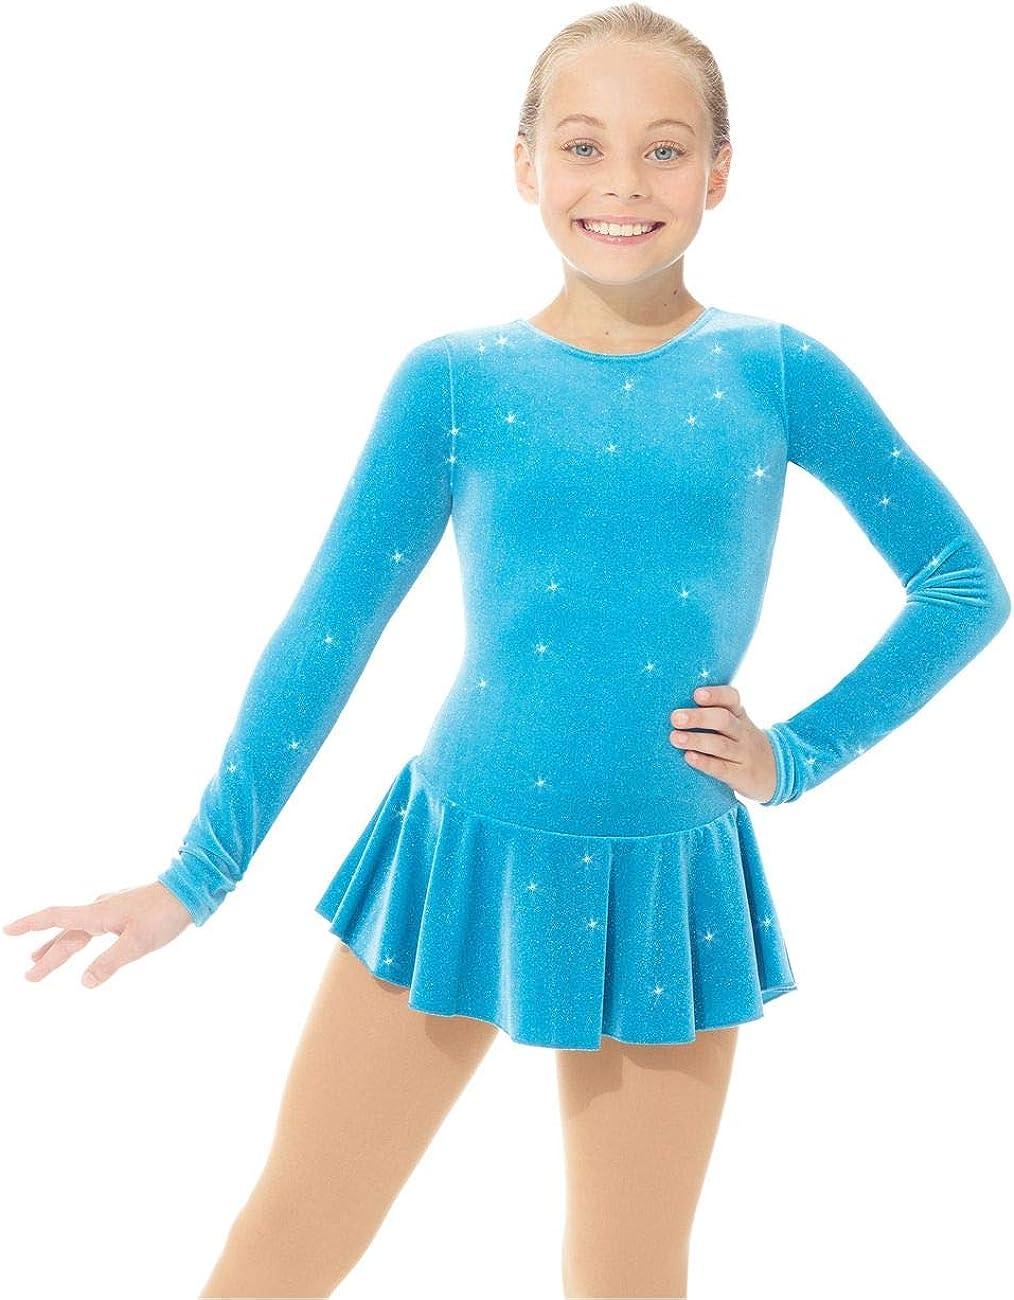 Mondor Girls Figure Skating Dress Green Glitter Size Junior 6X-7